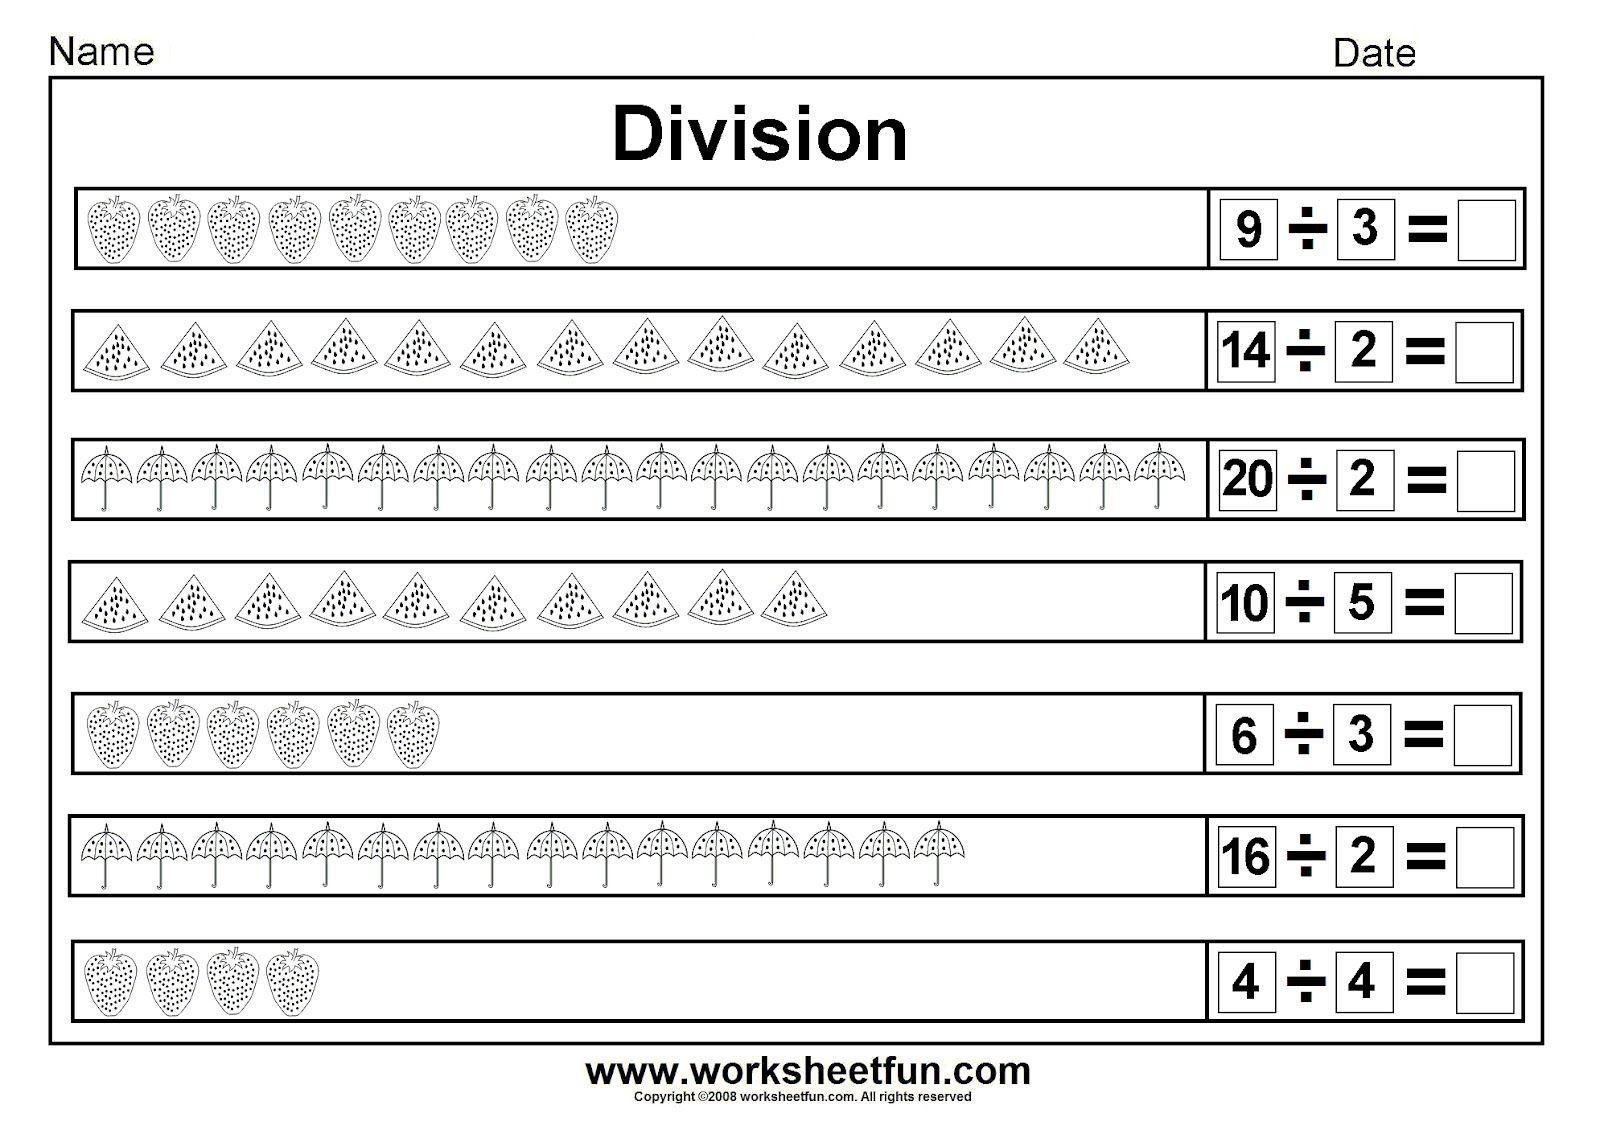 worksheet Beginner Multiplication Worksheets division worksheets beginner picture sharing equally 14